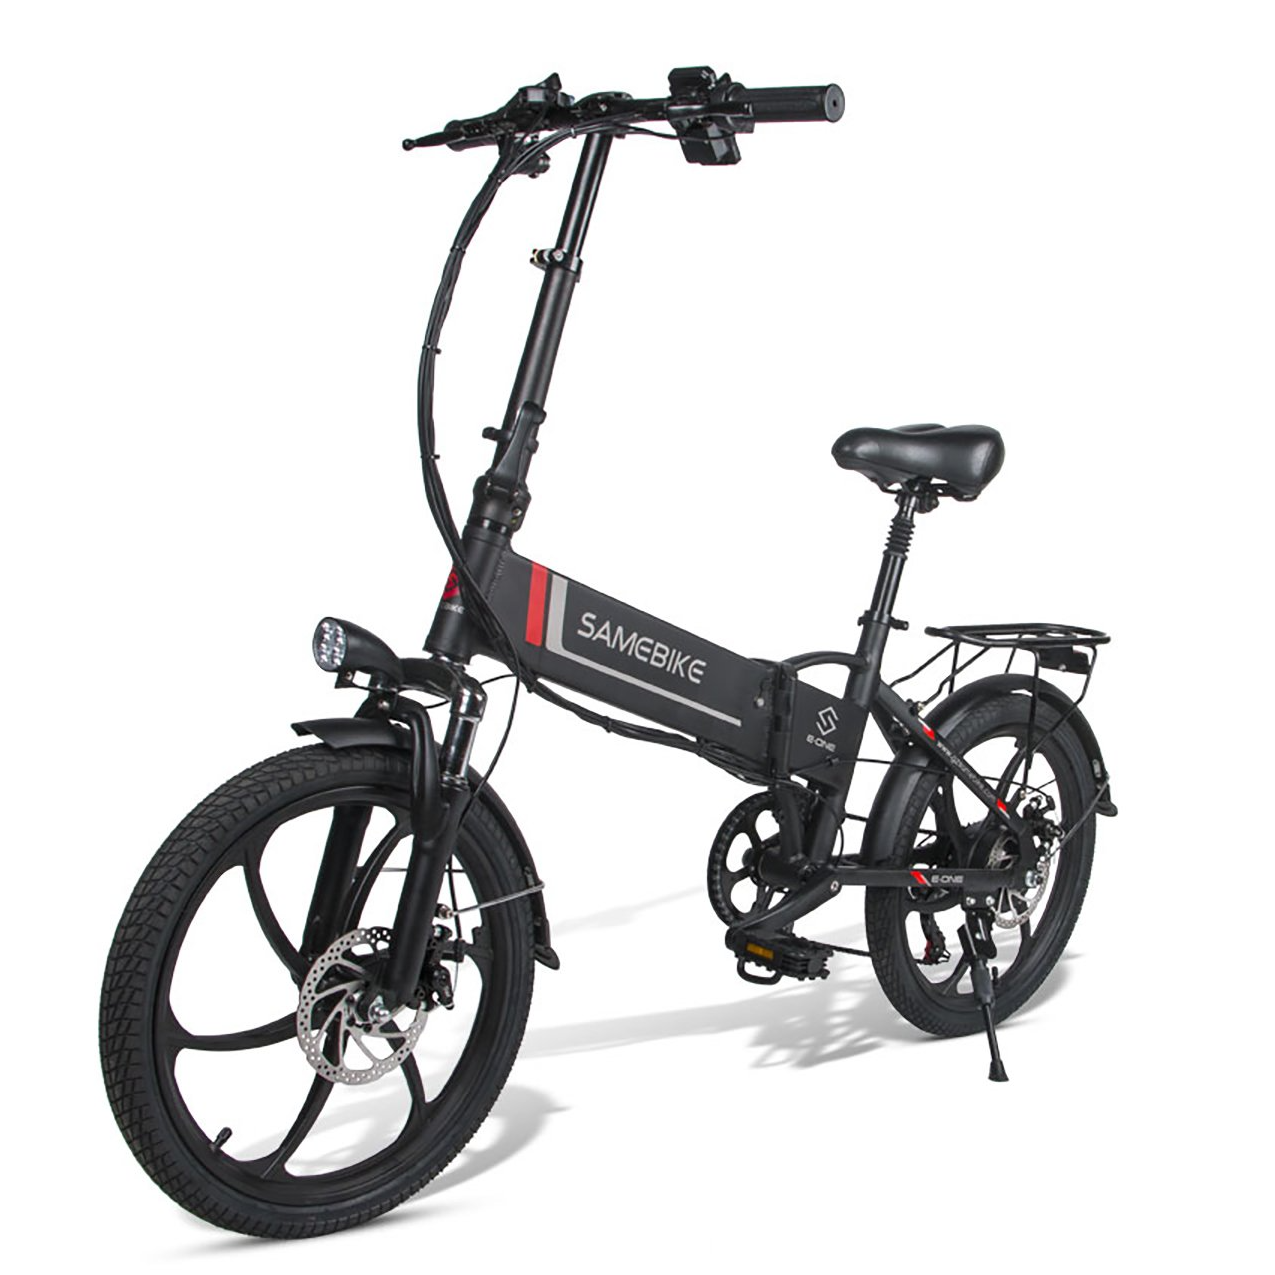 SAMEBIKE 20LVXD30 Folding Electric Bike 20 Inch Tires 350W Motor 10.4Ah Battery Max 35 KPH Ship from Poland Warehouse